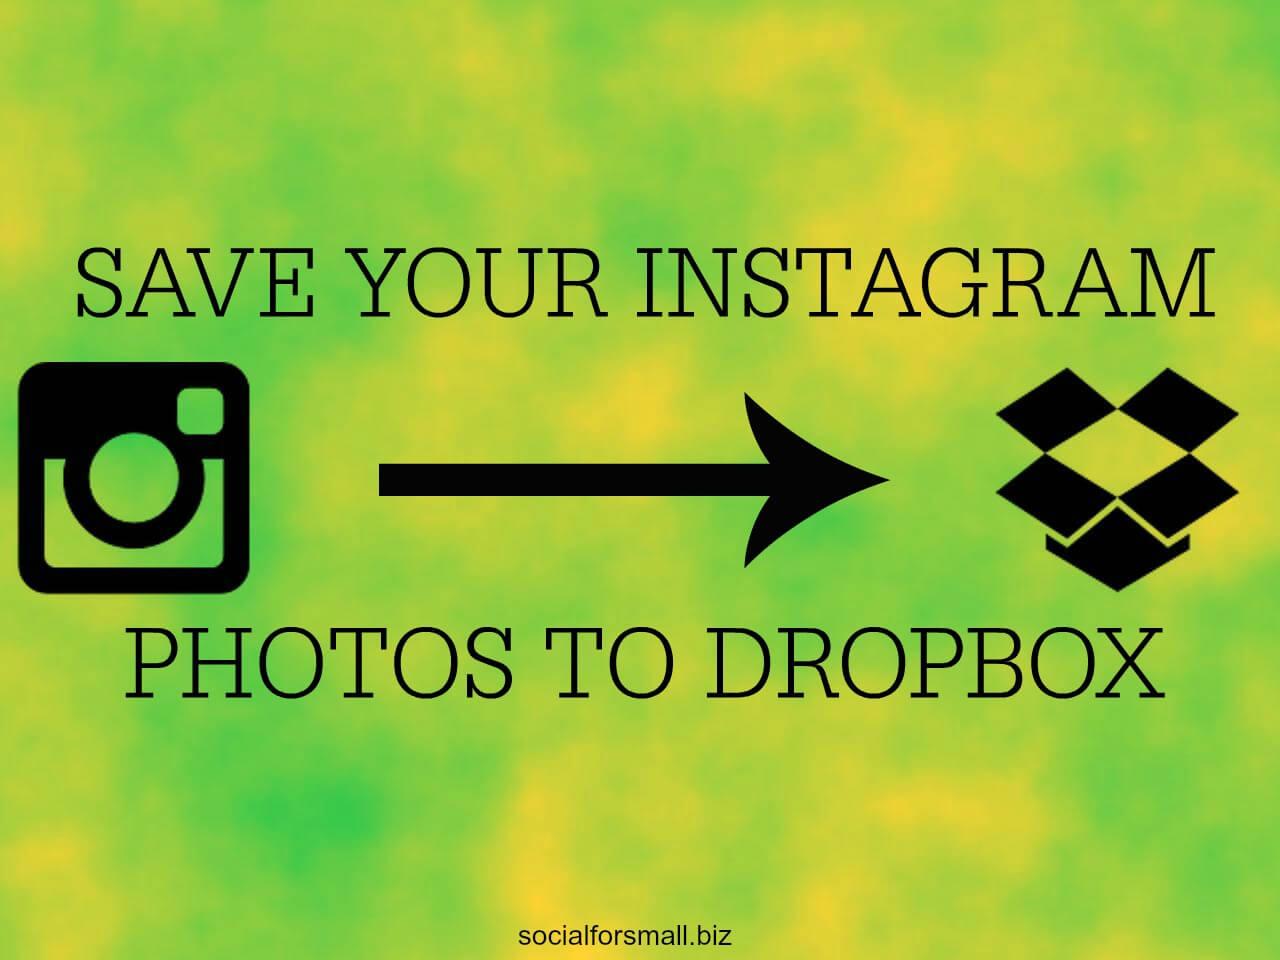 save your instagram photos to dropbox